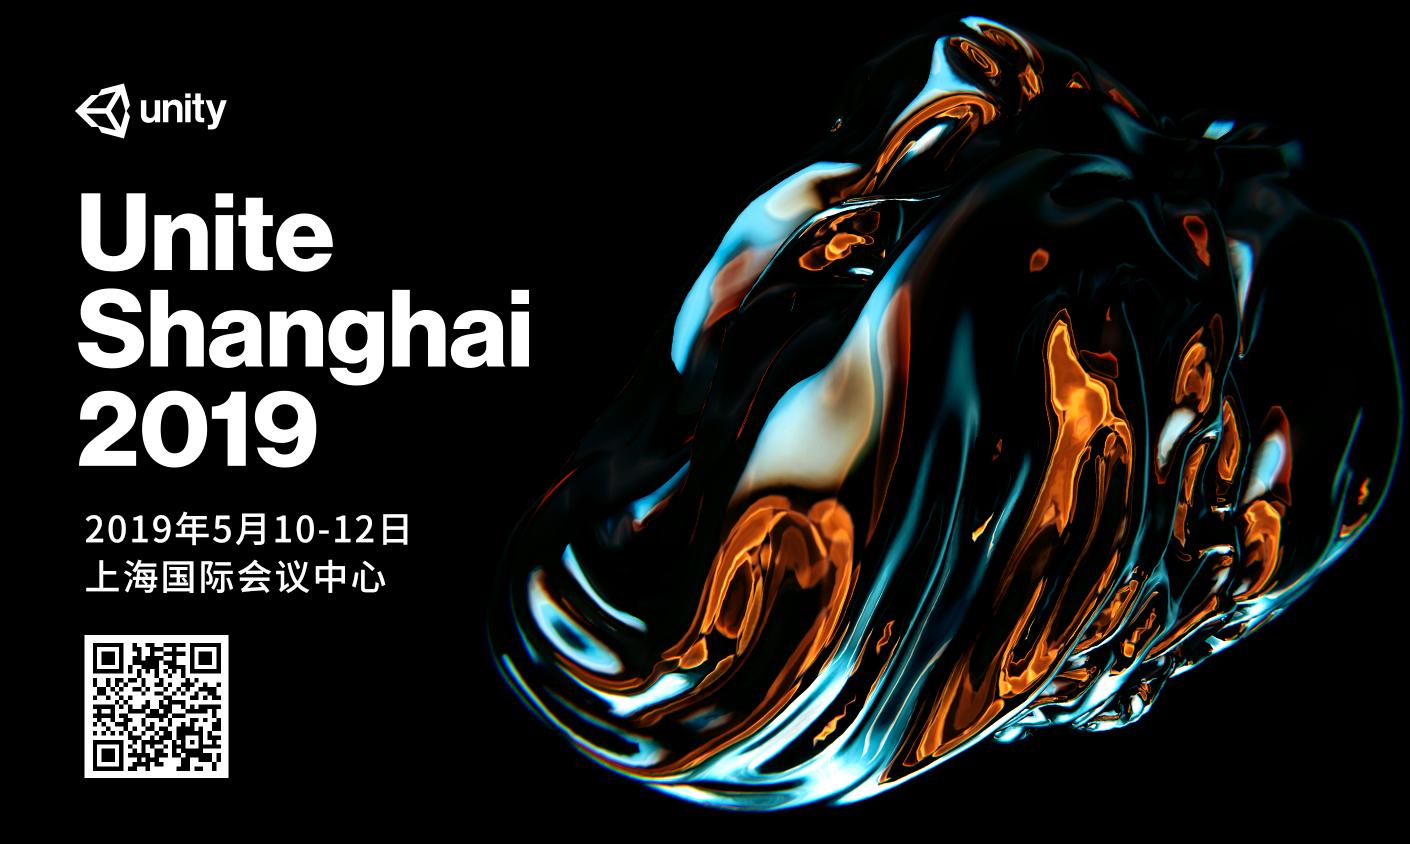 Unite Shanghai 2019 特惠票价倒计时!